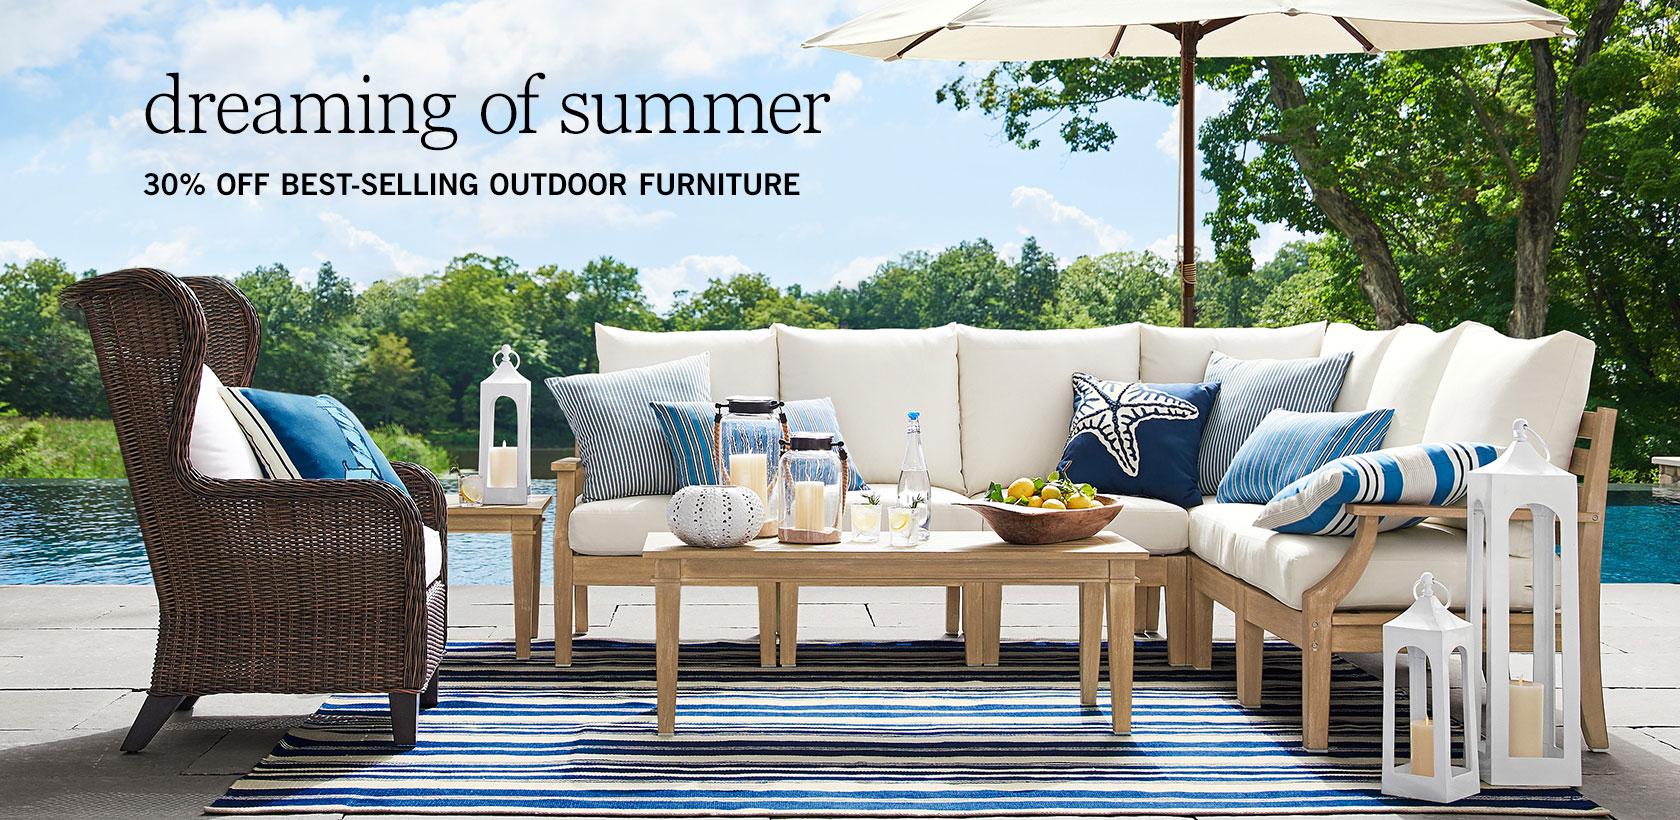 outdoor furniture sale - Outdoor Furniture Sale